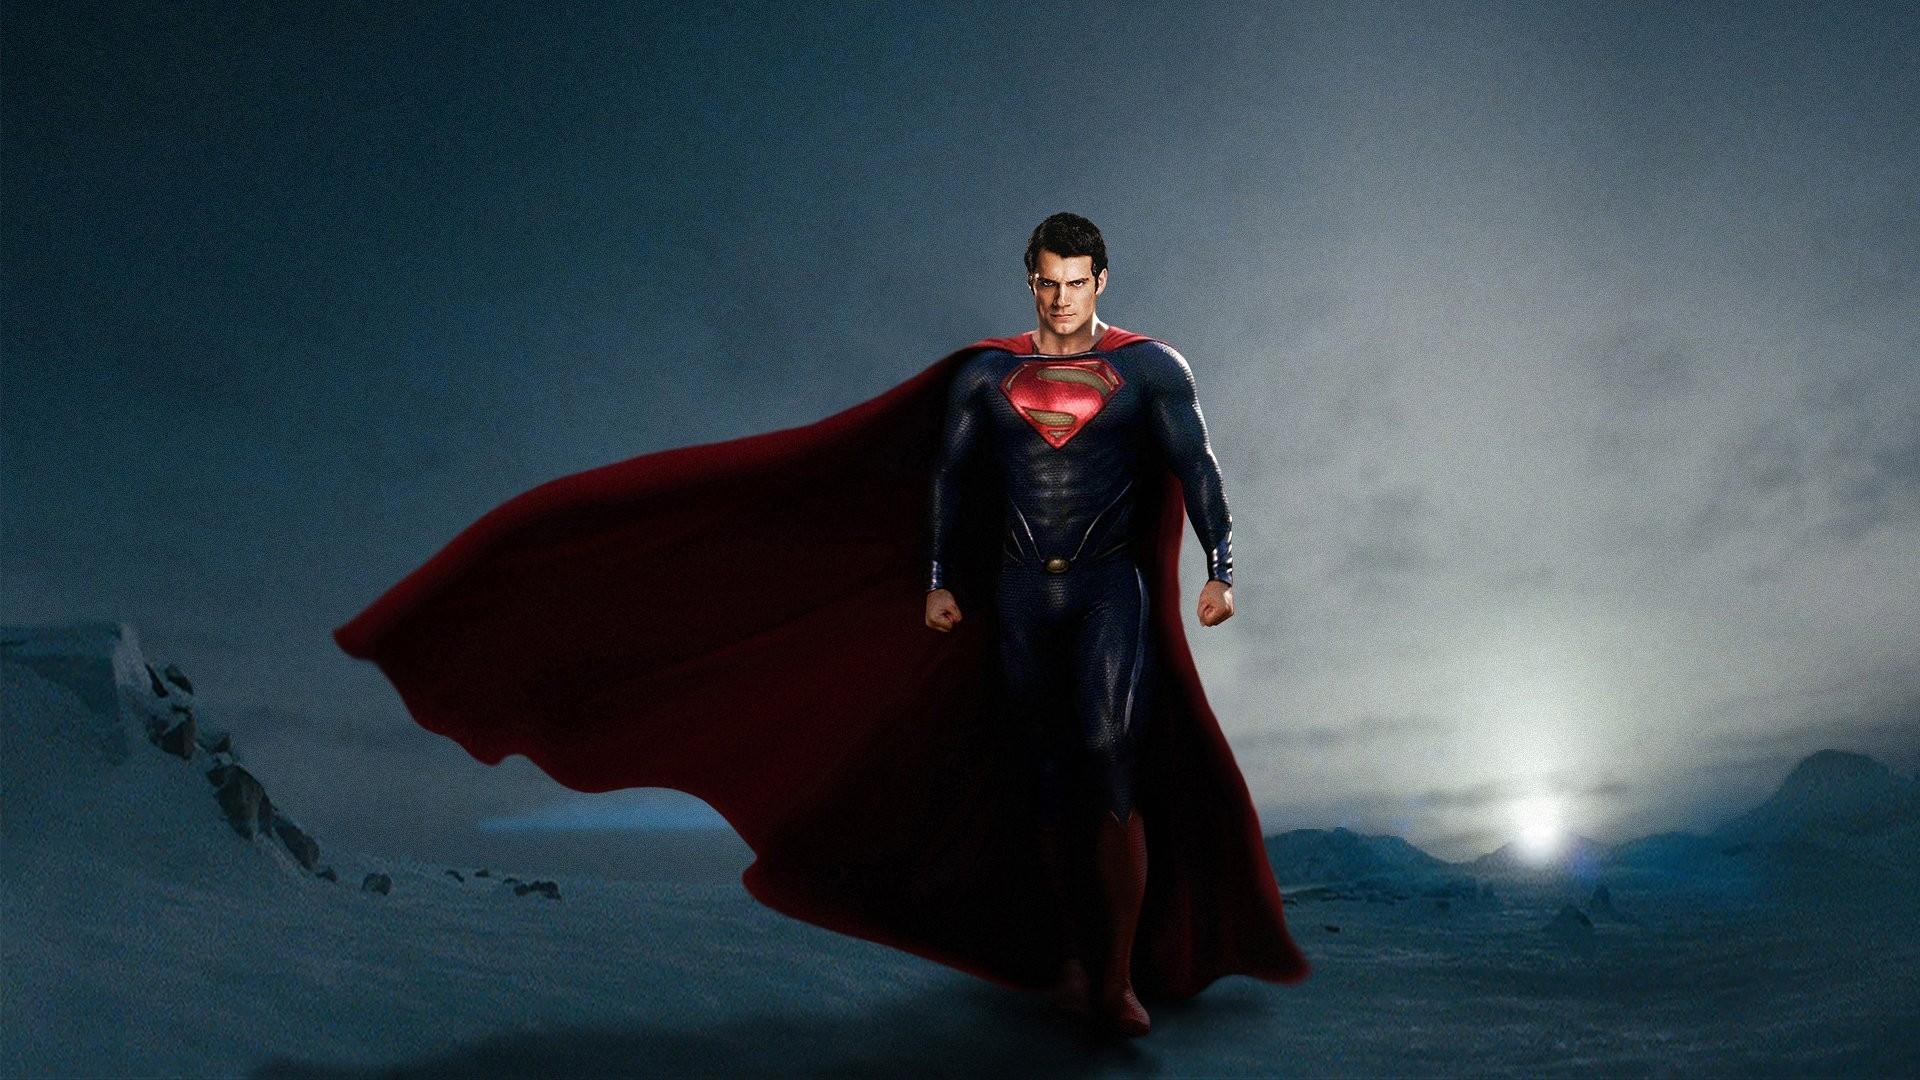 superman in man of steel wallpapers   hd wallpapers   id #12320